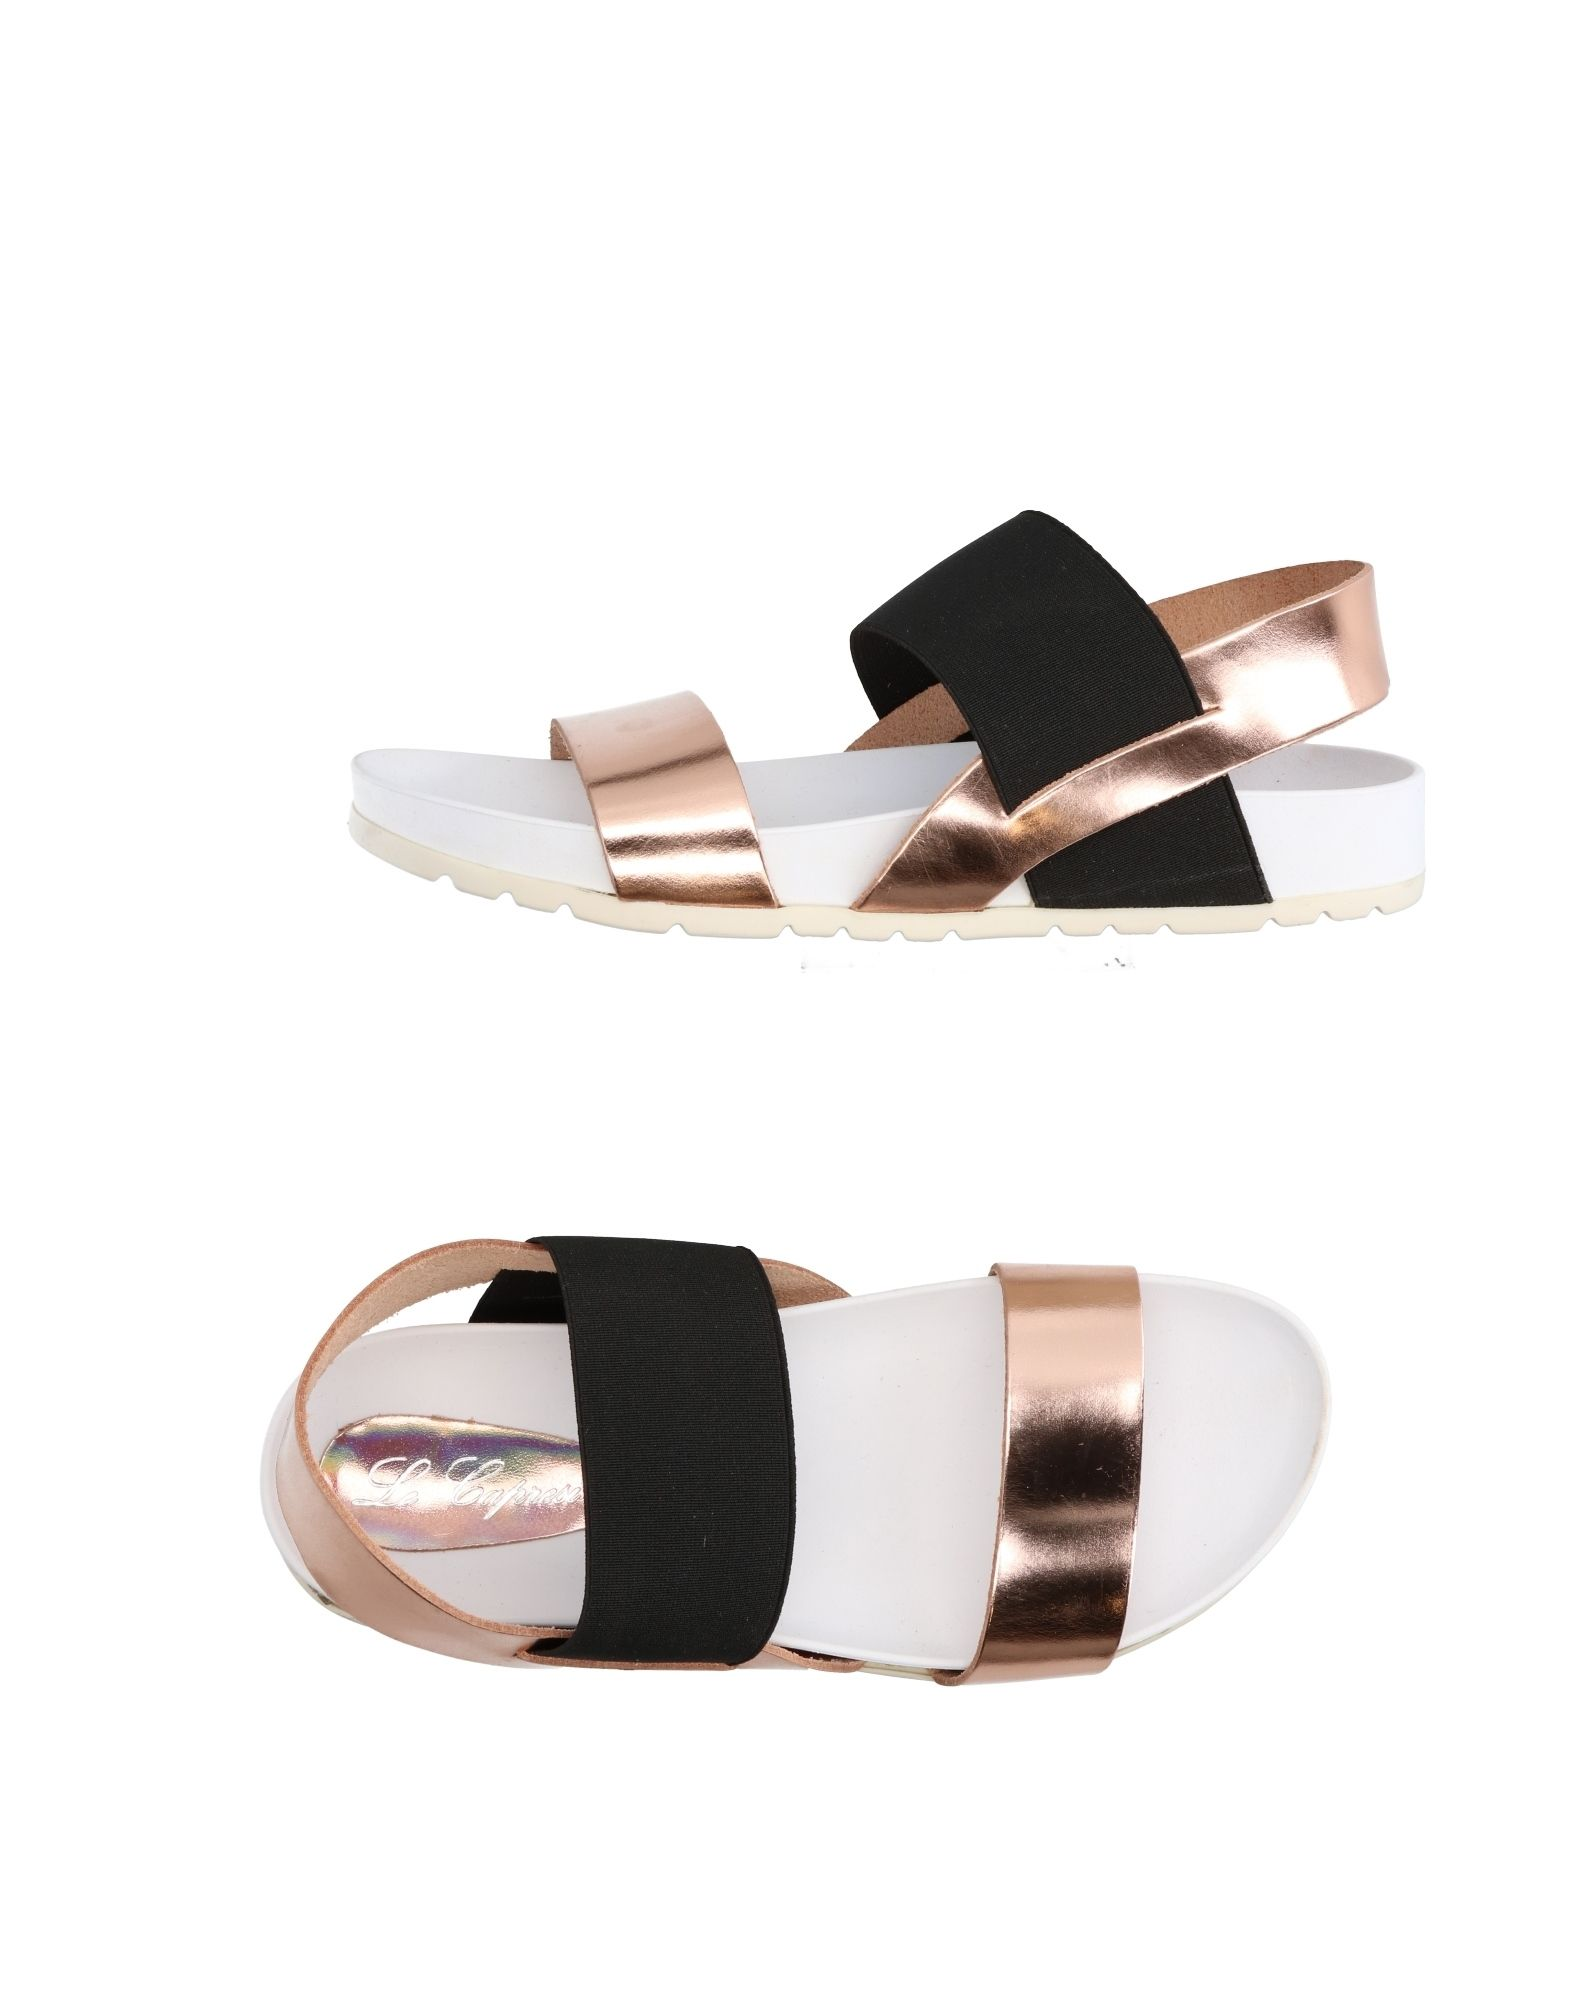 LE CAPRESI Sandals in Copper